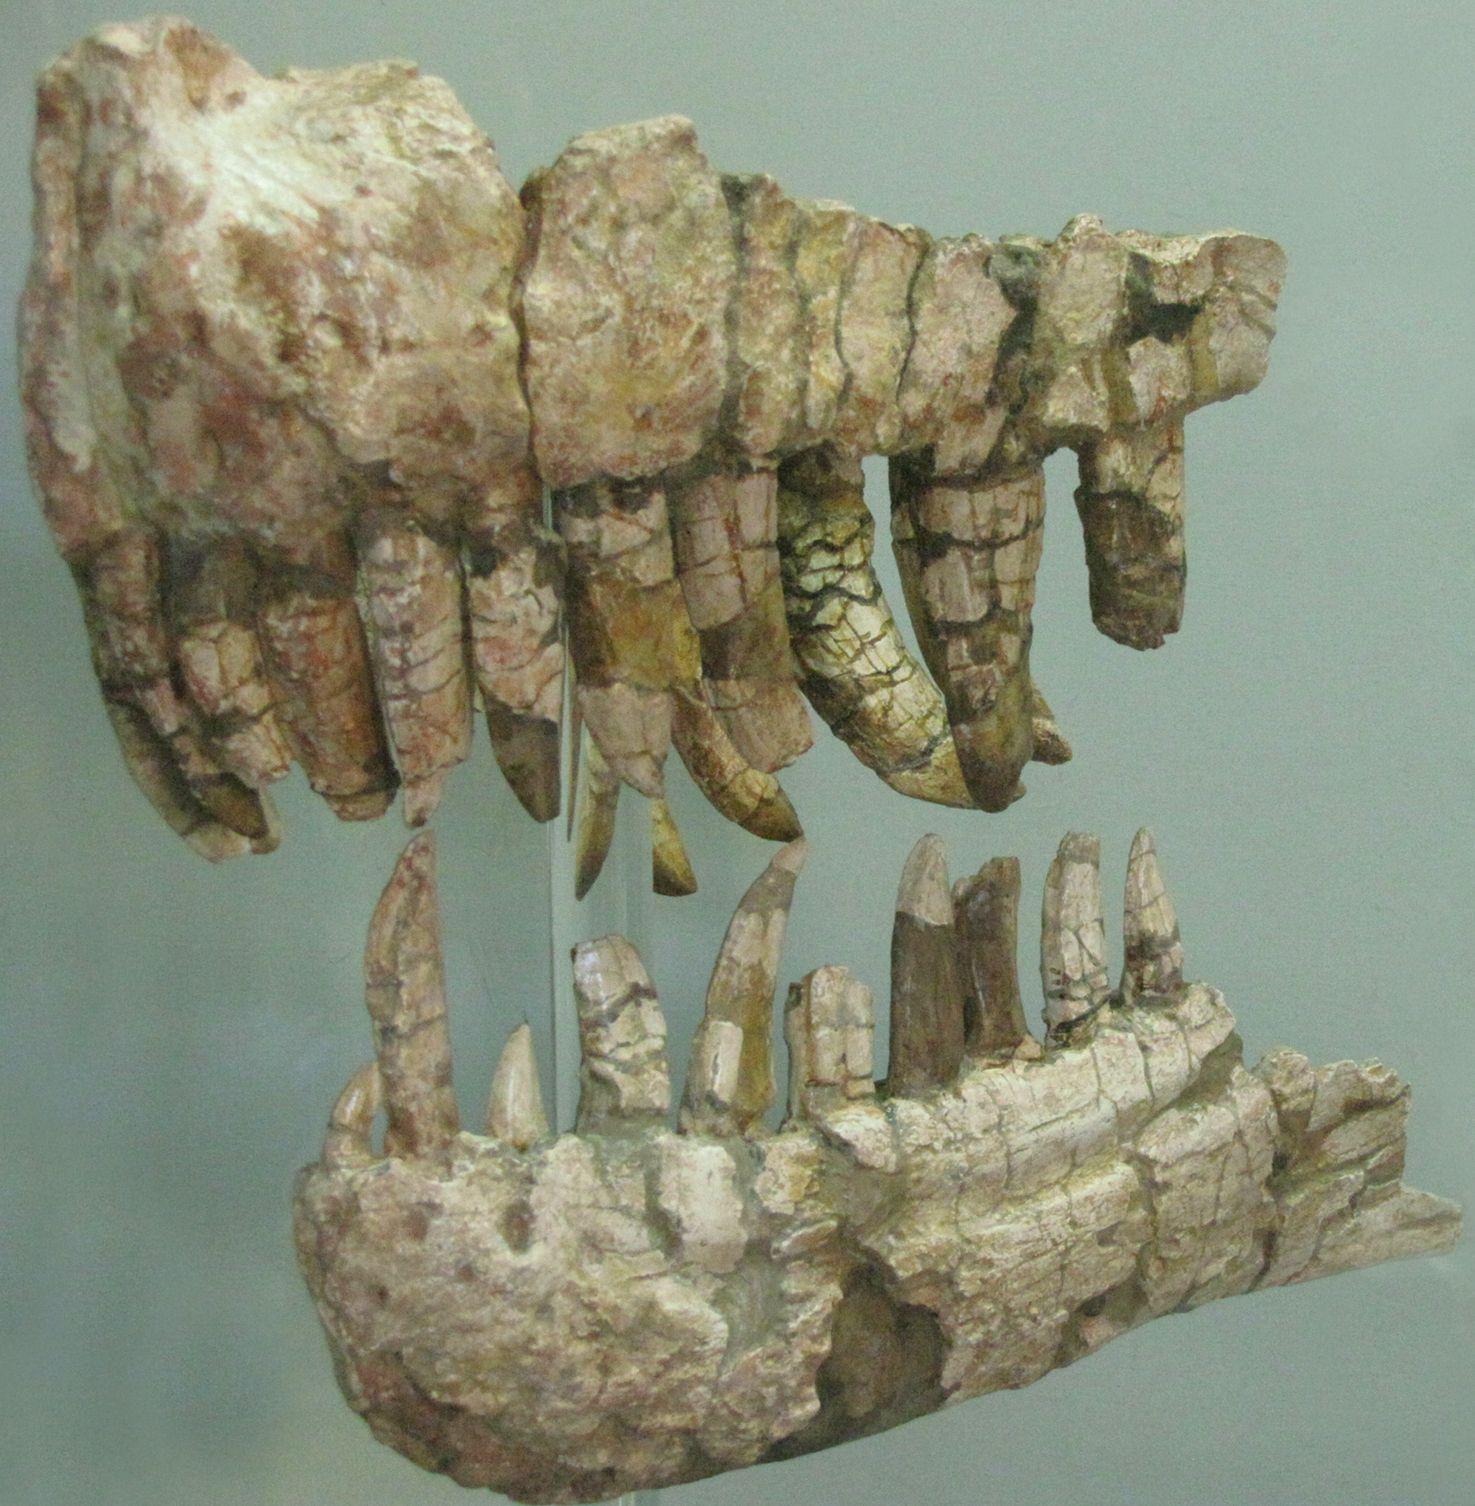 Genyodectes_saurus_jaws.jpg (1475×1506) - Holotype. Auteur : Patricia Cursio. 2009